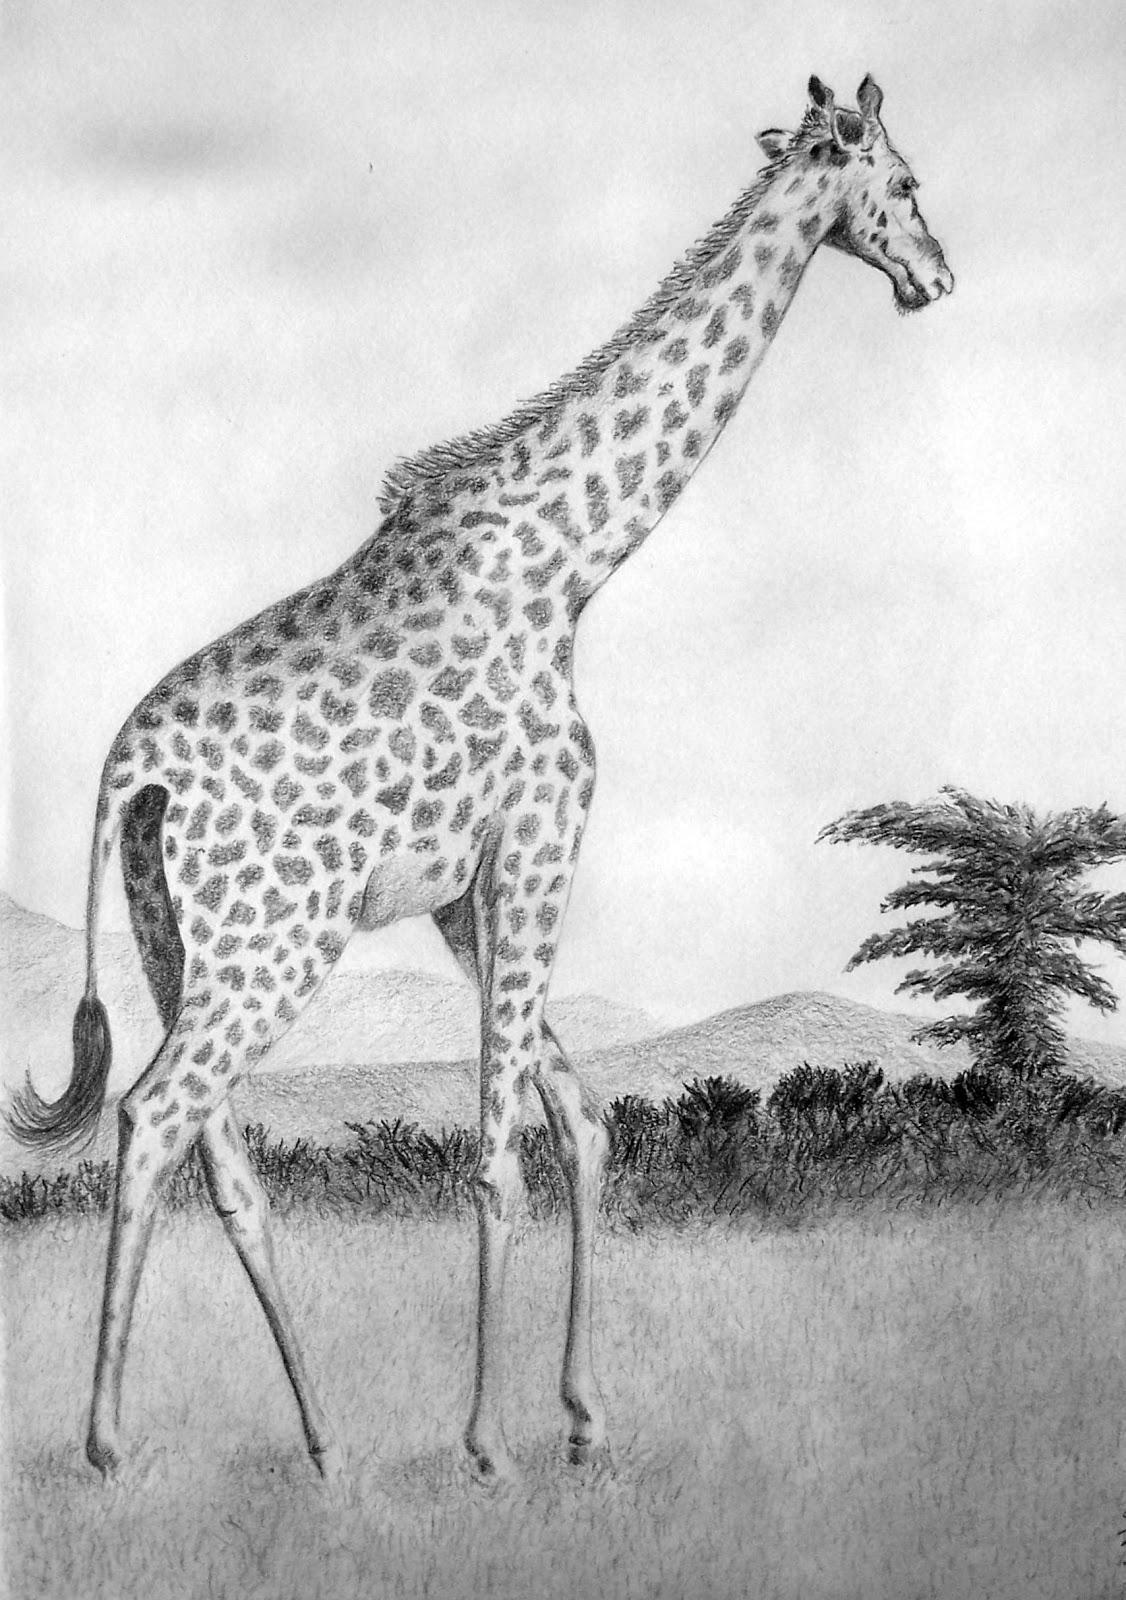 Jim Hartlage Art: January 2013 Cool Giraffe Drawing